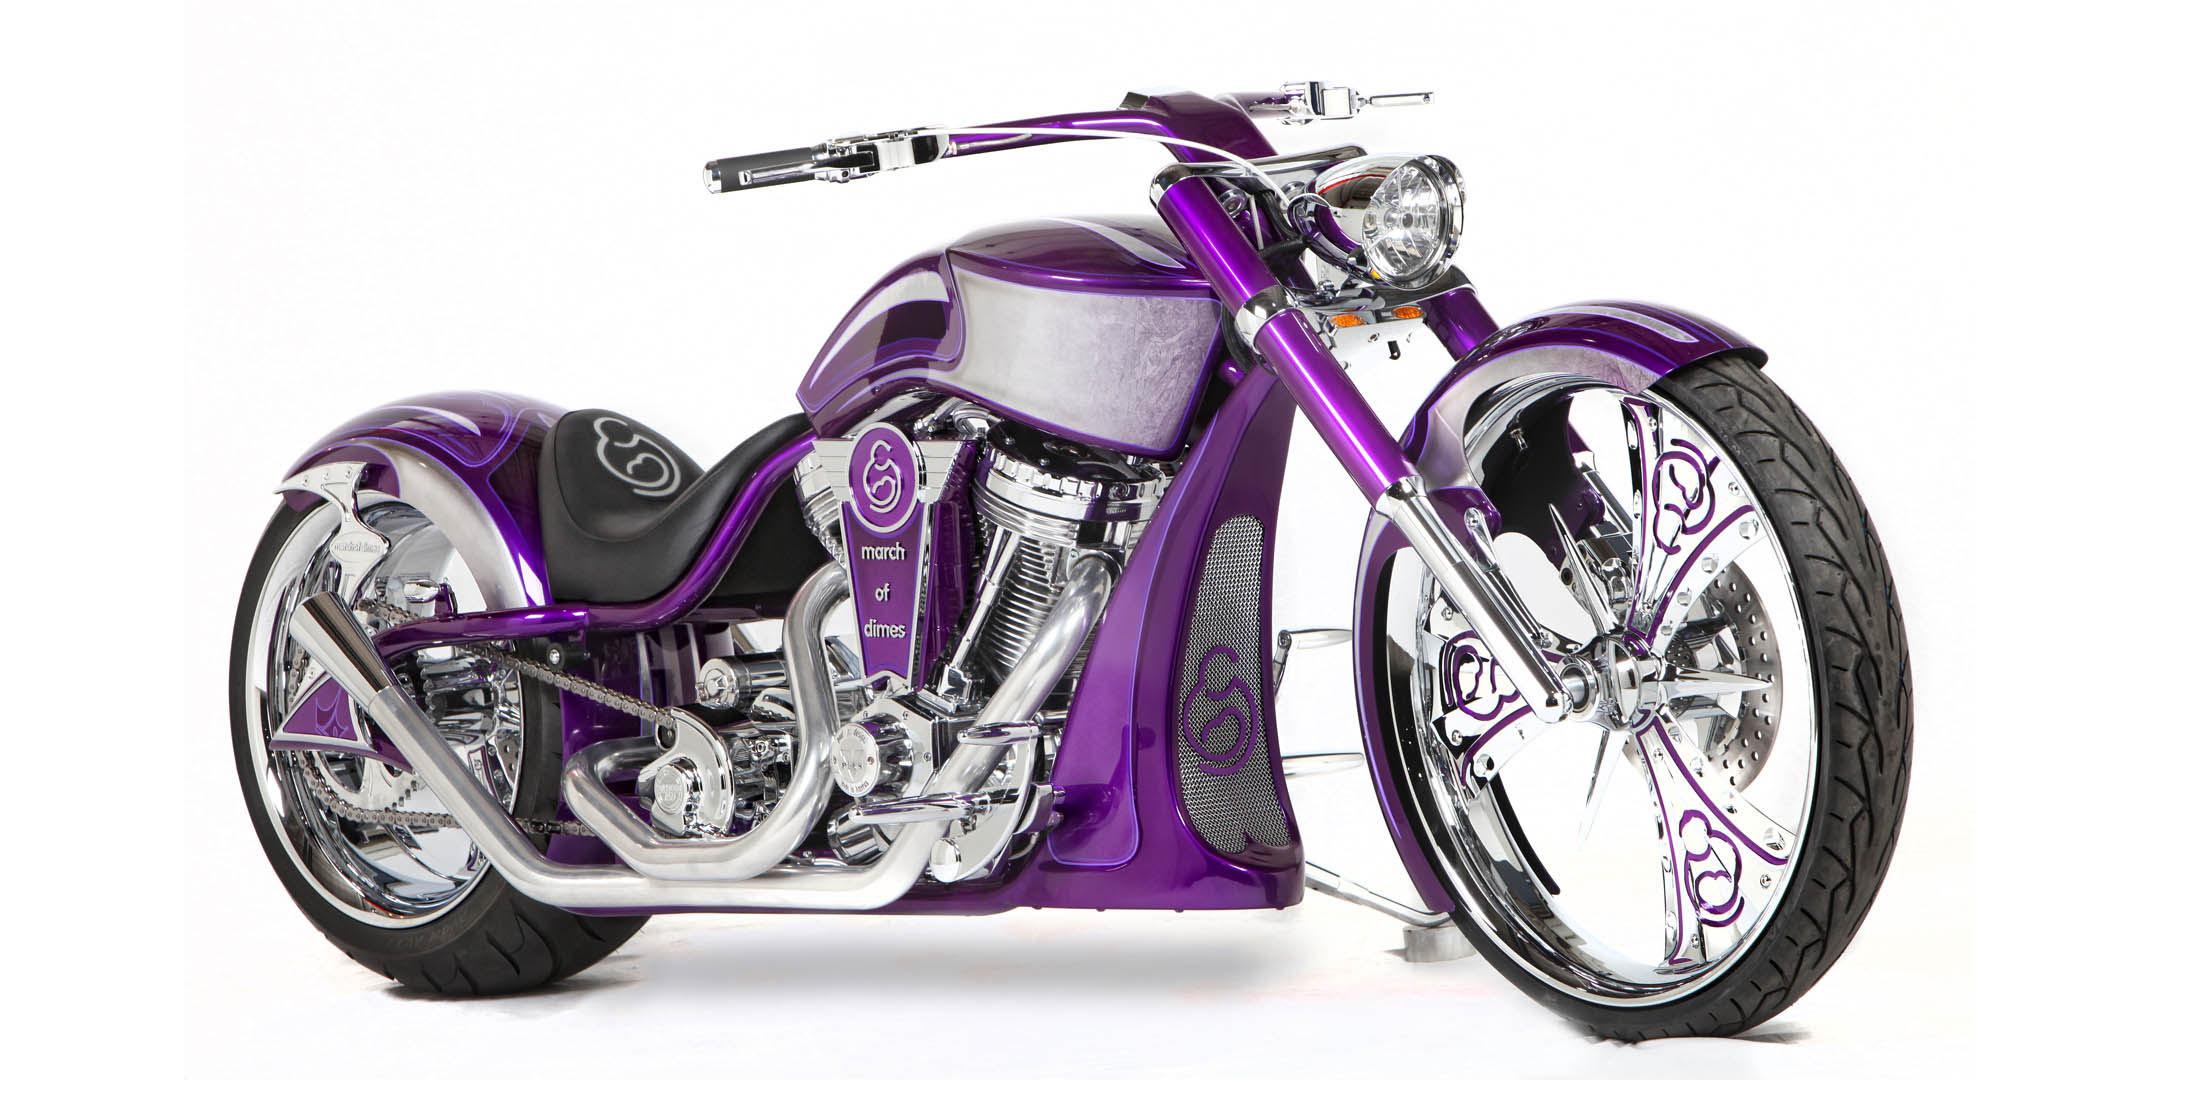 paul-jr-designs-march-of-dimes-bike-012